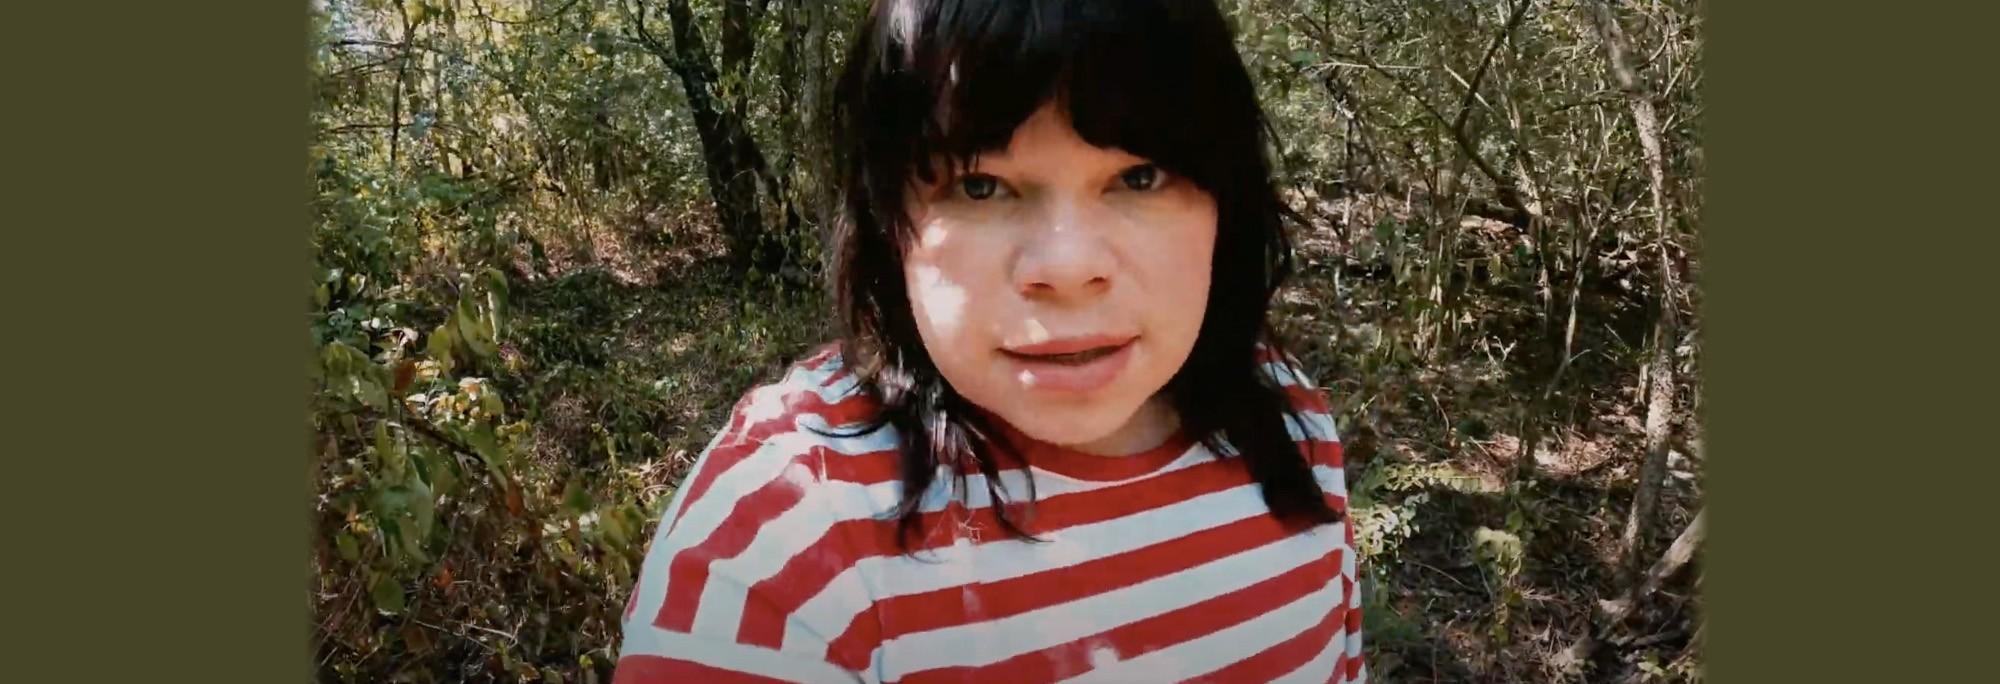 Samantha Crain - Reunion (Lyric Video)